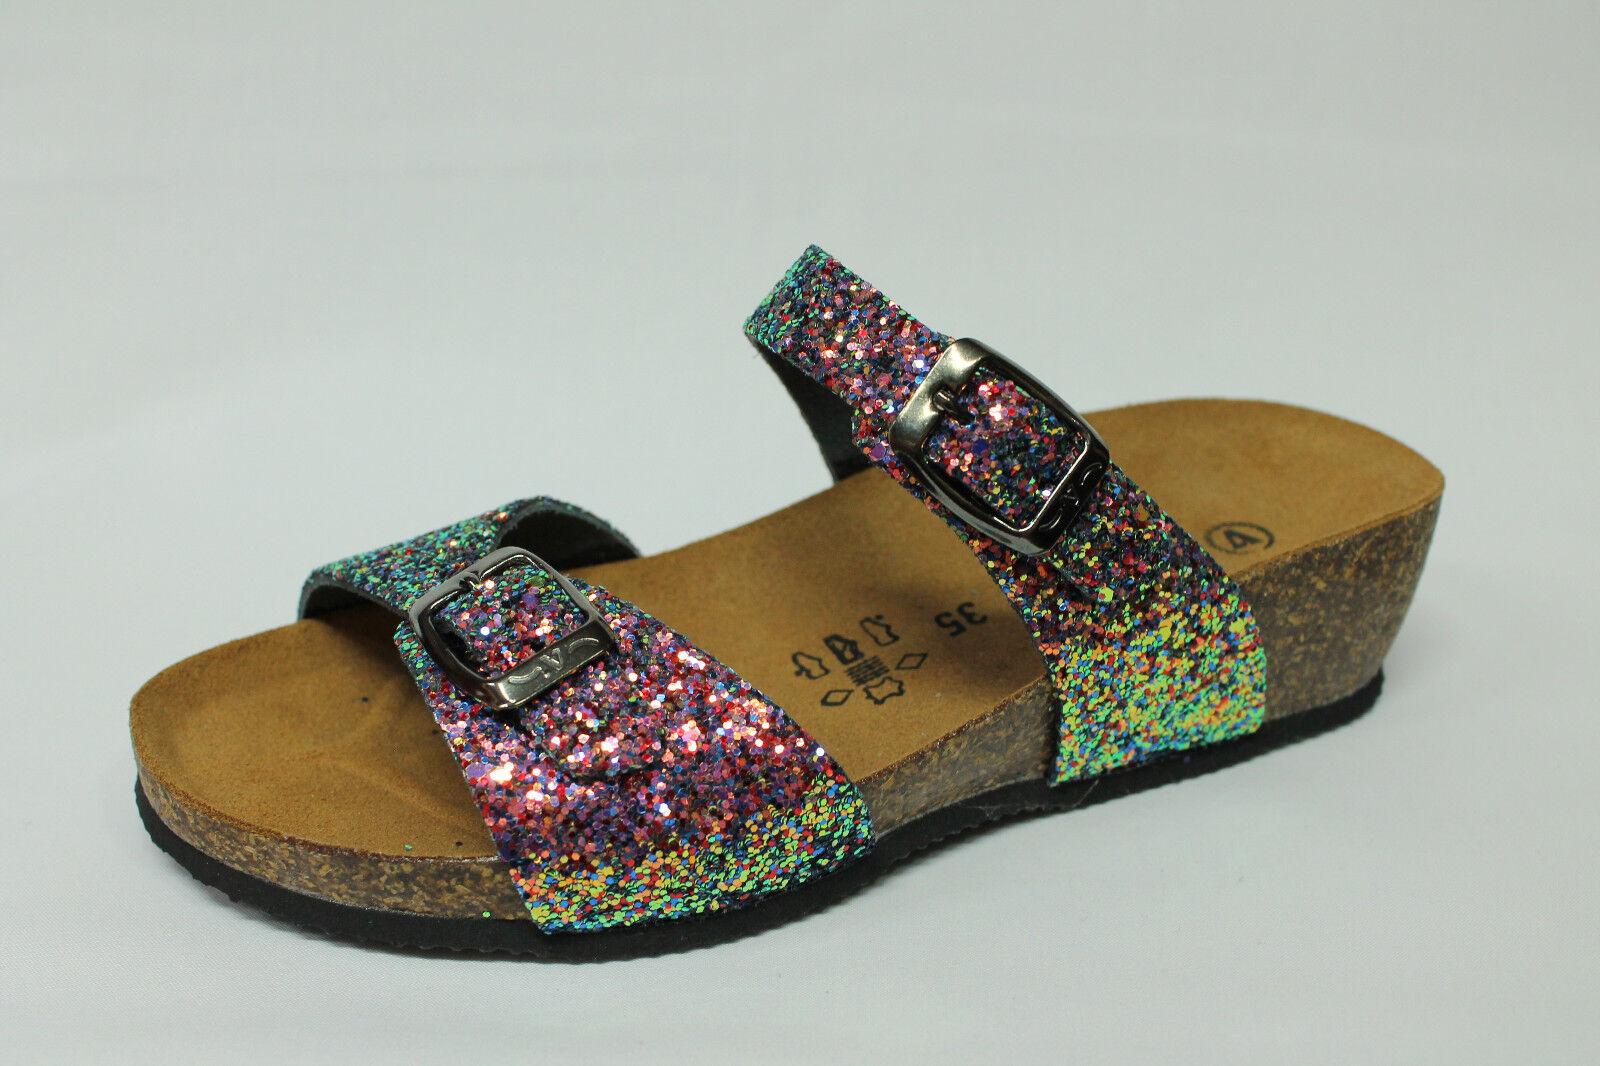 Sandale ciabatte Valleverde G51289 glitter porpora zeppa 4 cm Made in